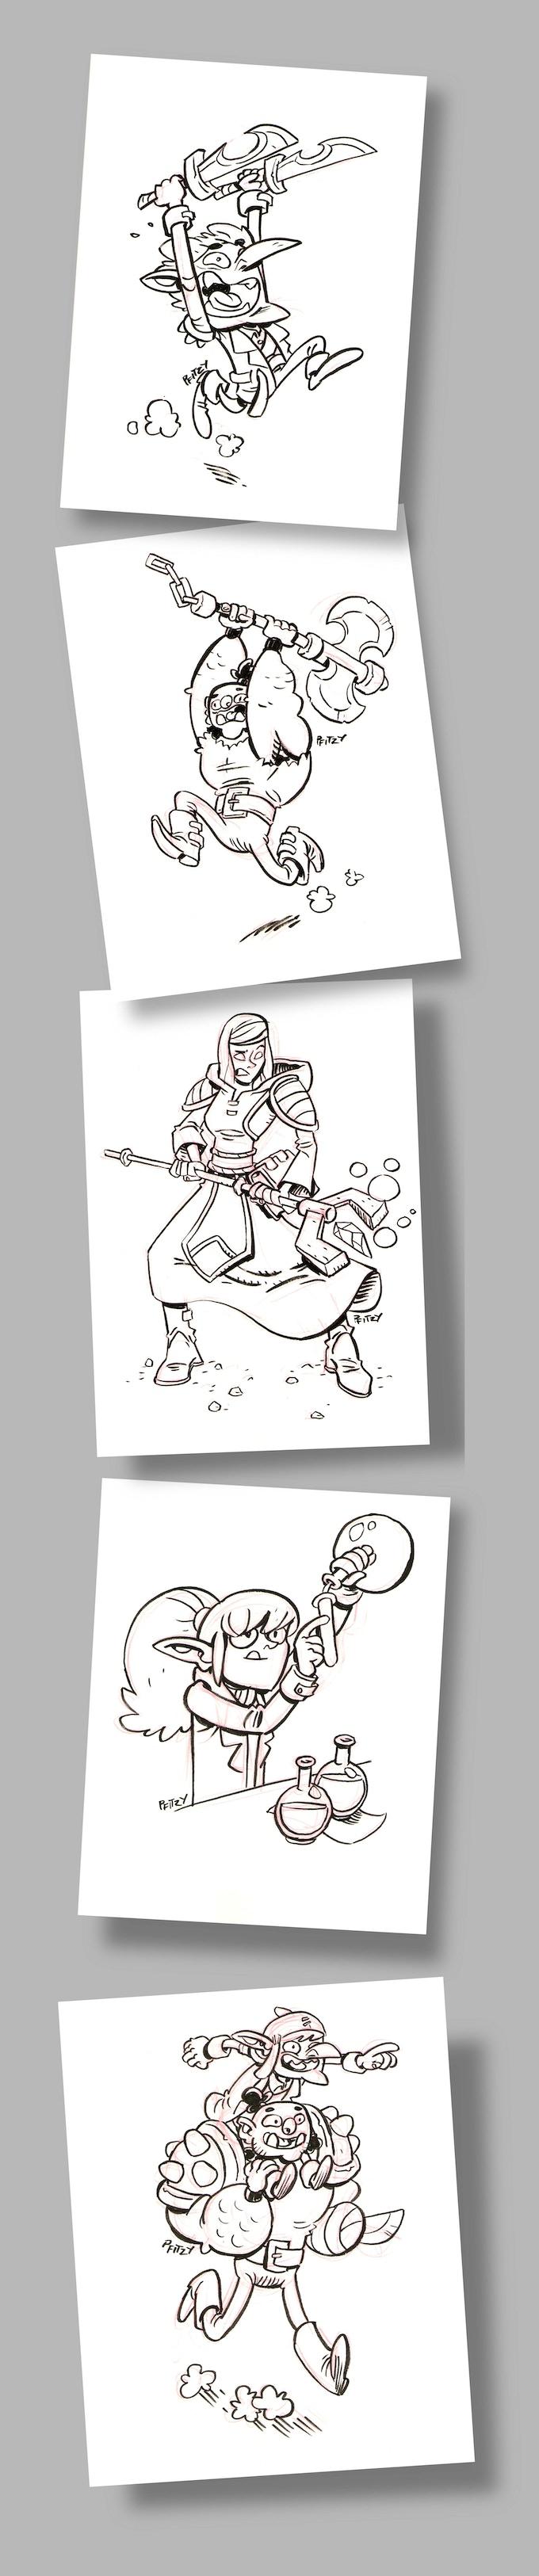 Some sketch page reward examples.